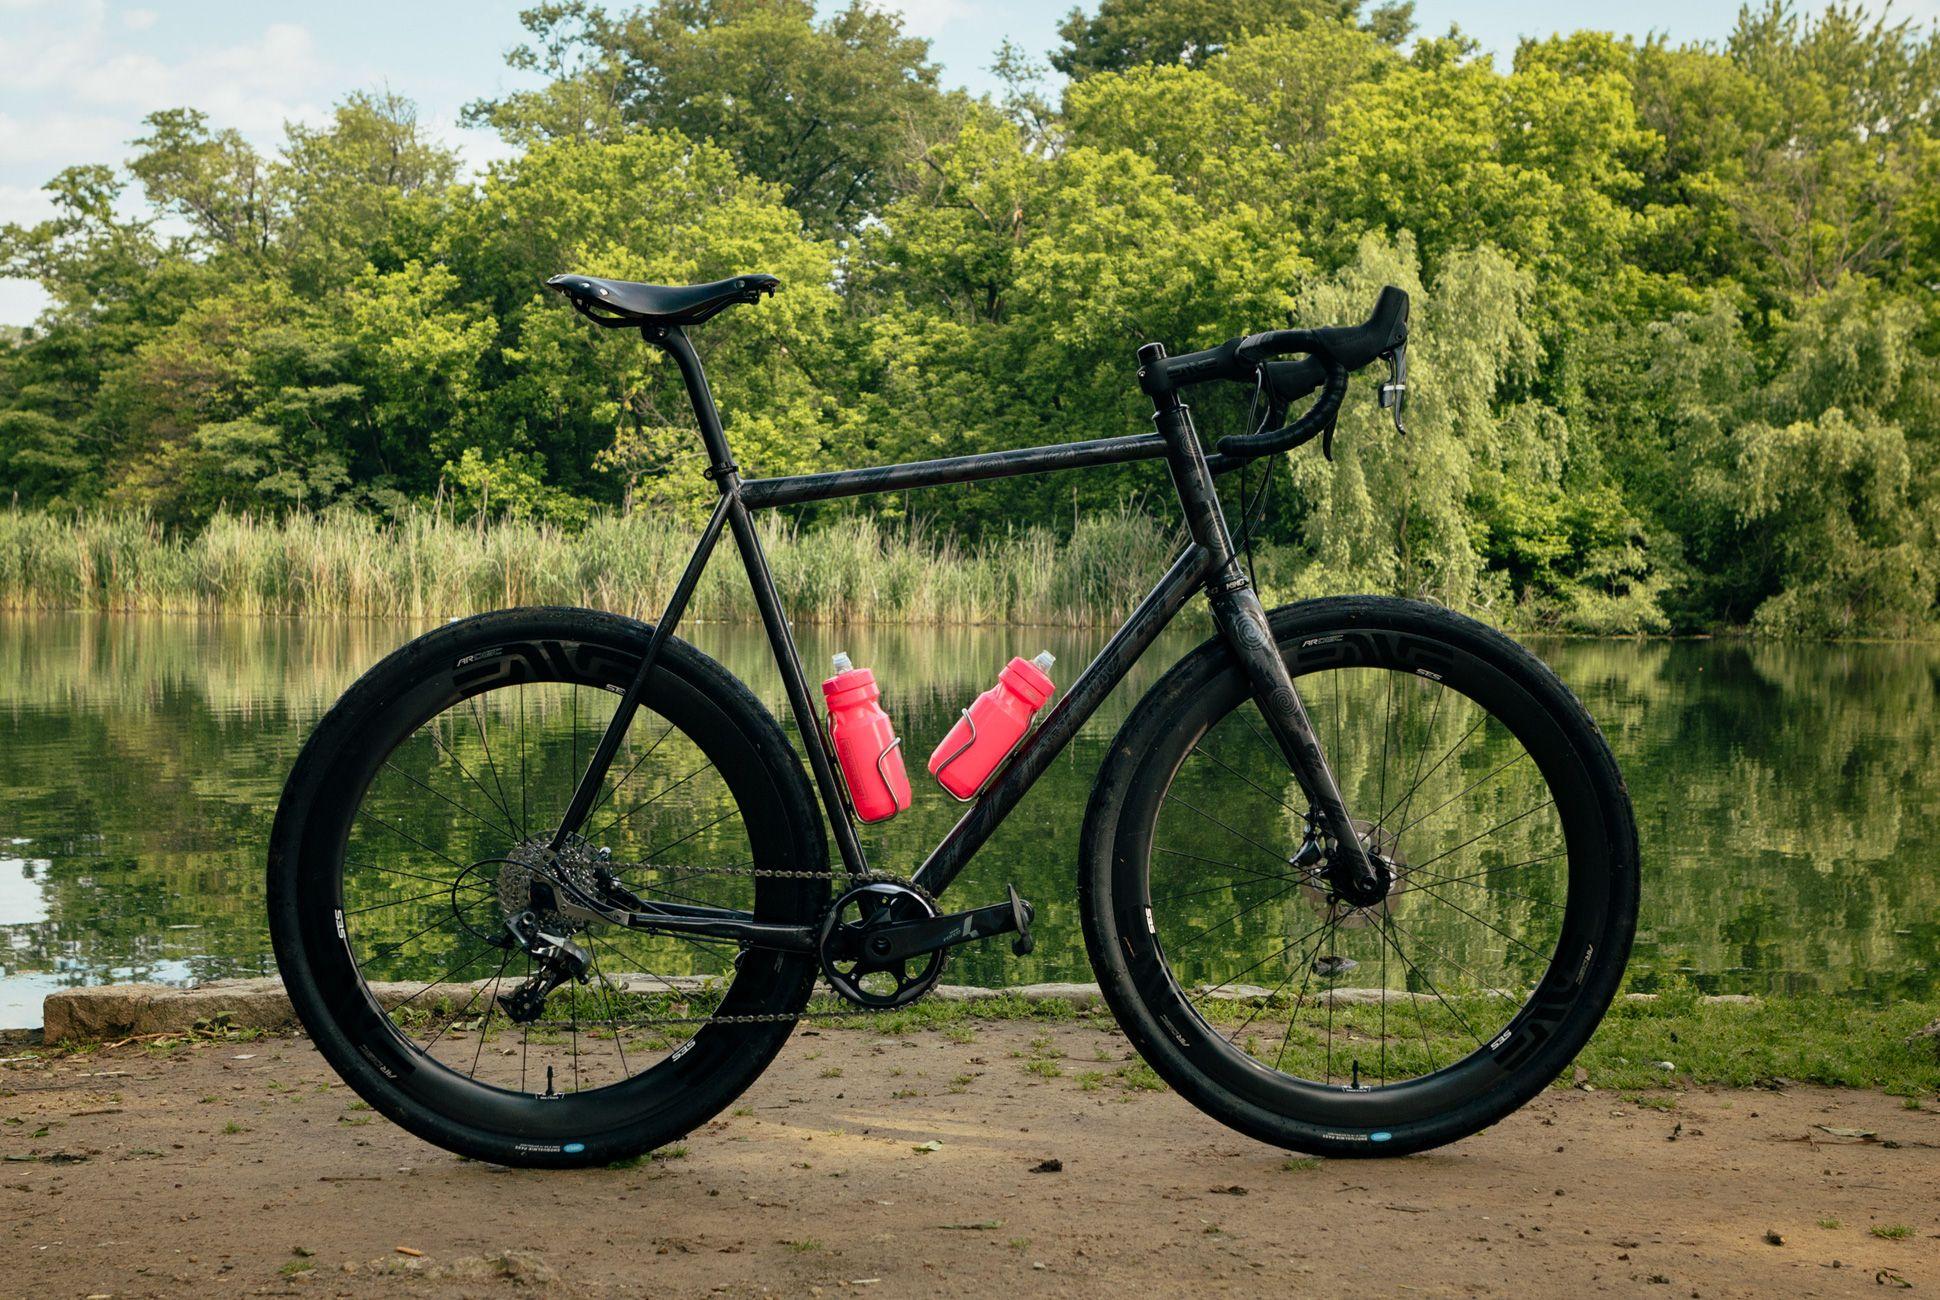 custom-american-bike-gear-patrol-build-slide-6